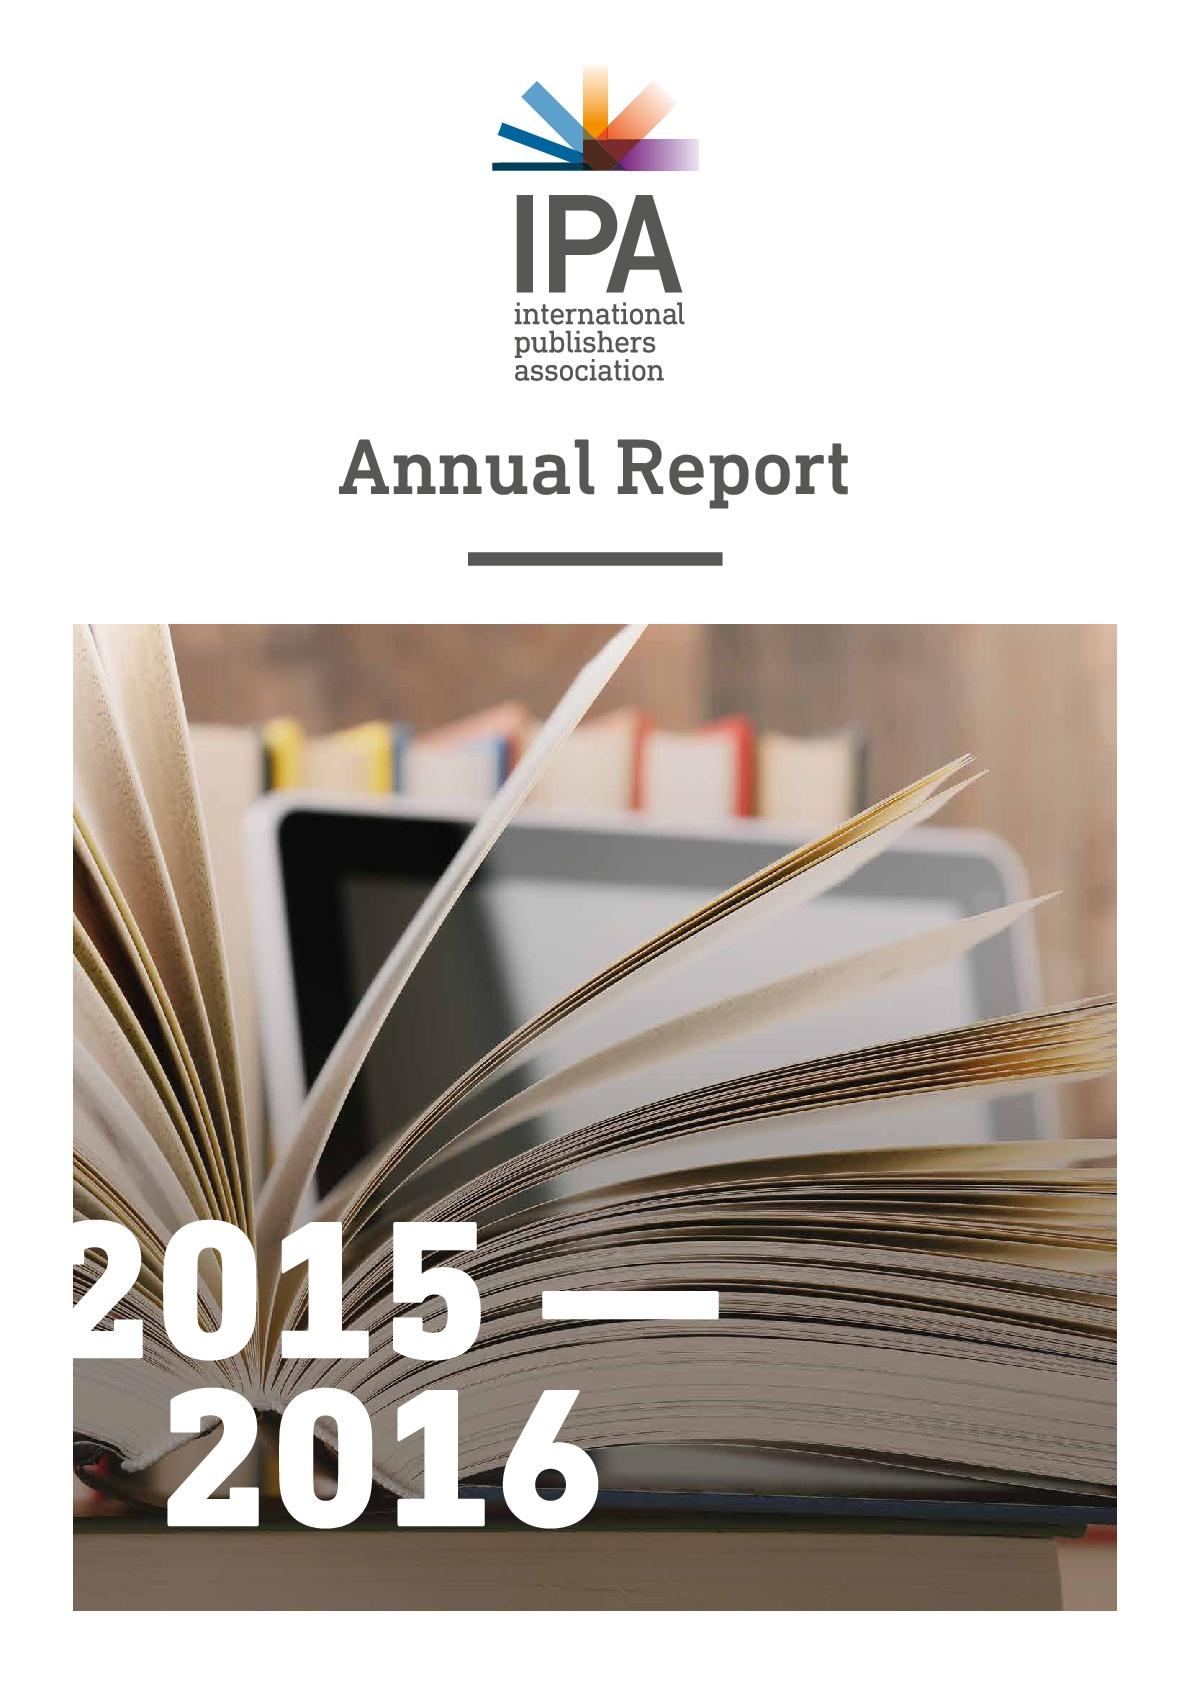 IPA Annual Report 2015-2016